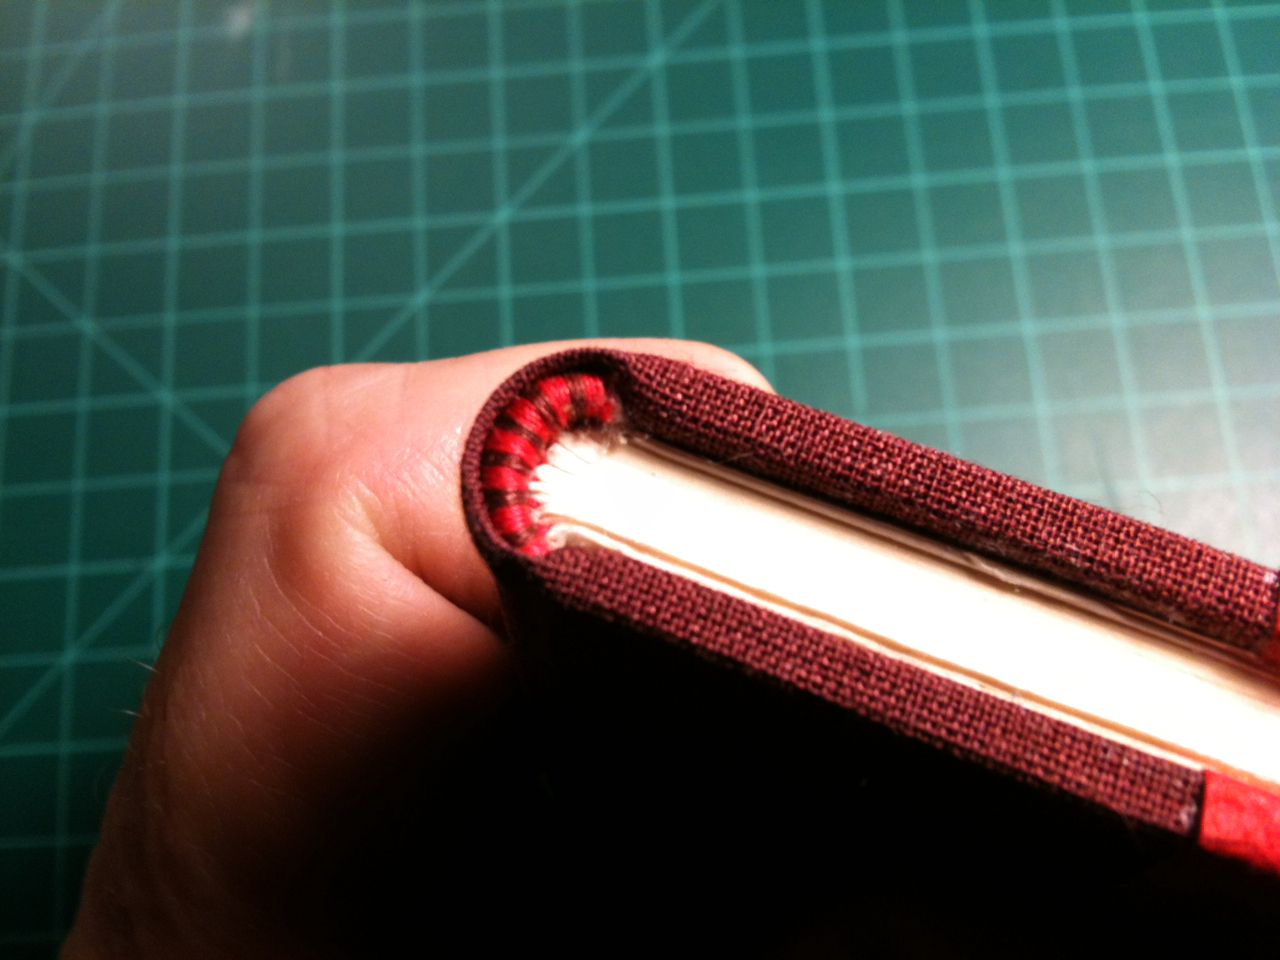 20111212-bookbinding-IMG_0478.jpg